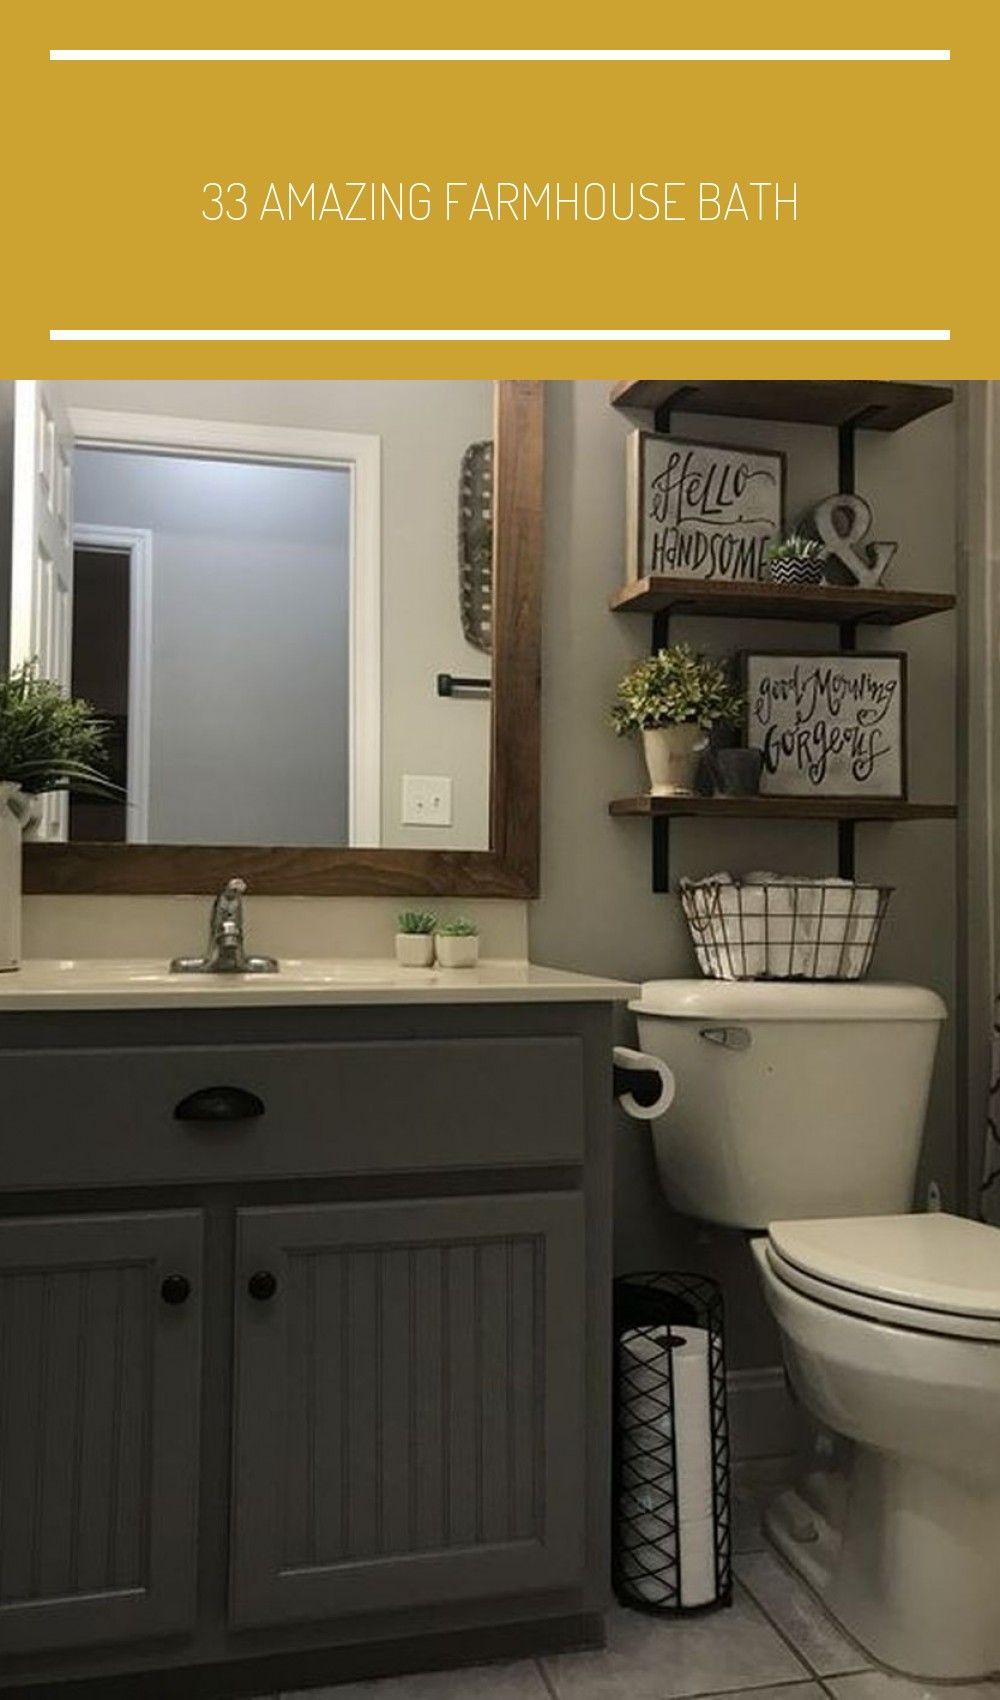 12 Amazing Farmhouse Bathroom Decor That You Should Copy - The